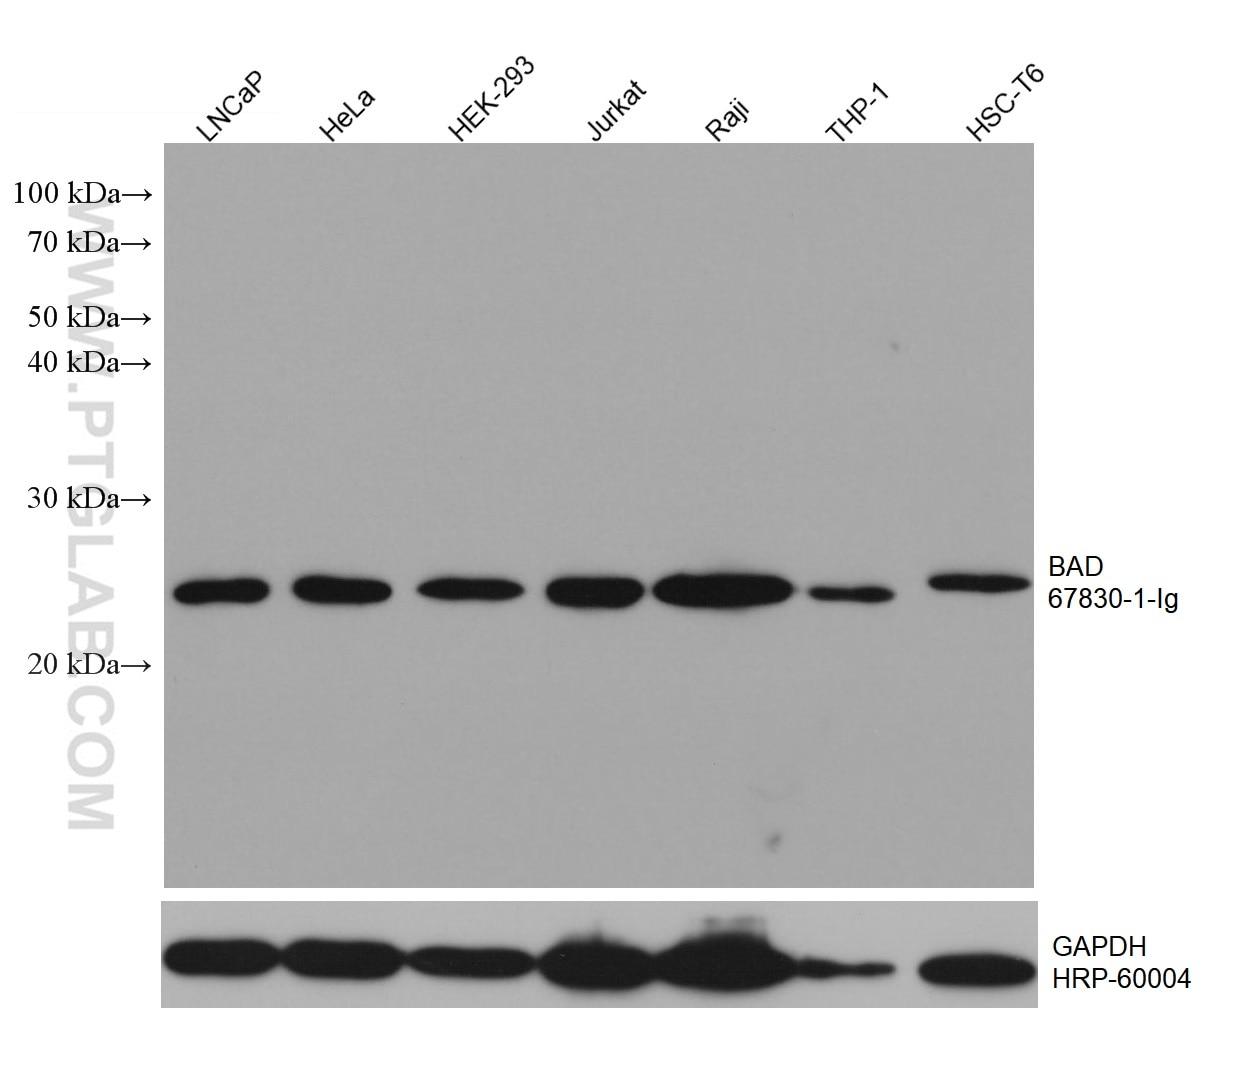 WB analysis using 67830-1-Ig